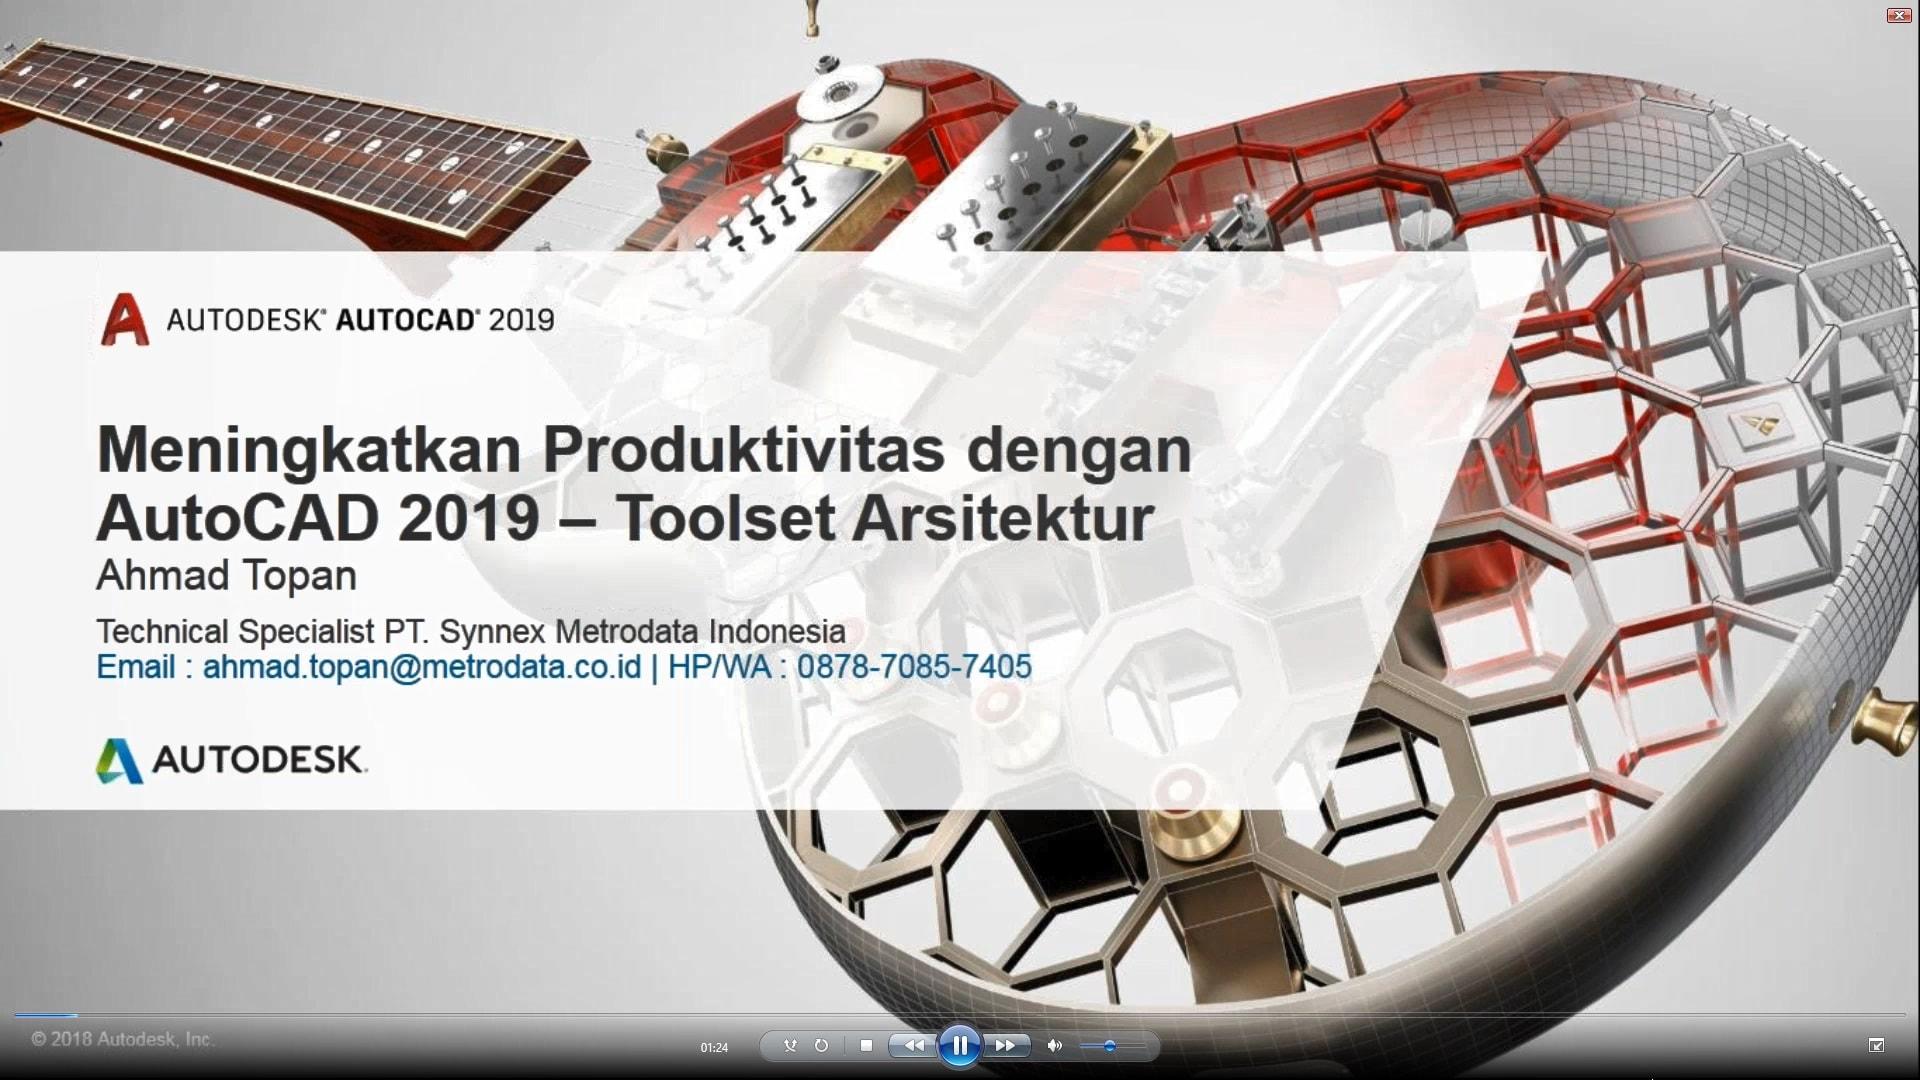 Meningkatkan Produktivitas dengan AutoCAD 2019: Toolset Arsitektur